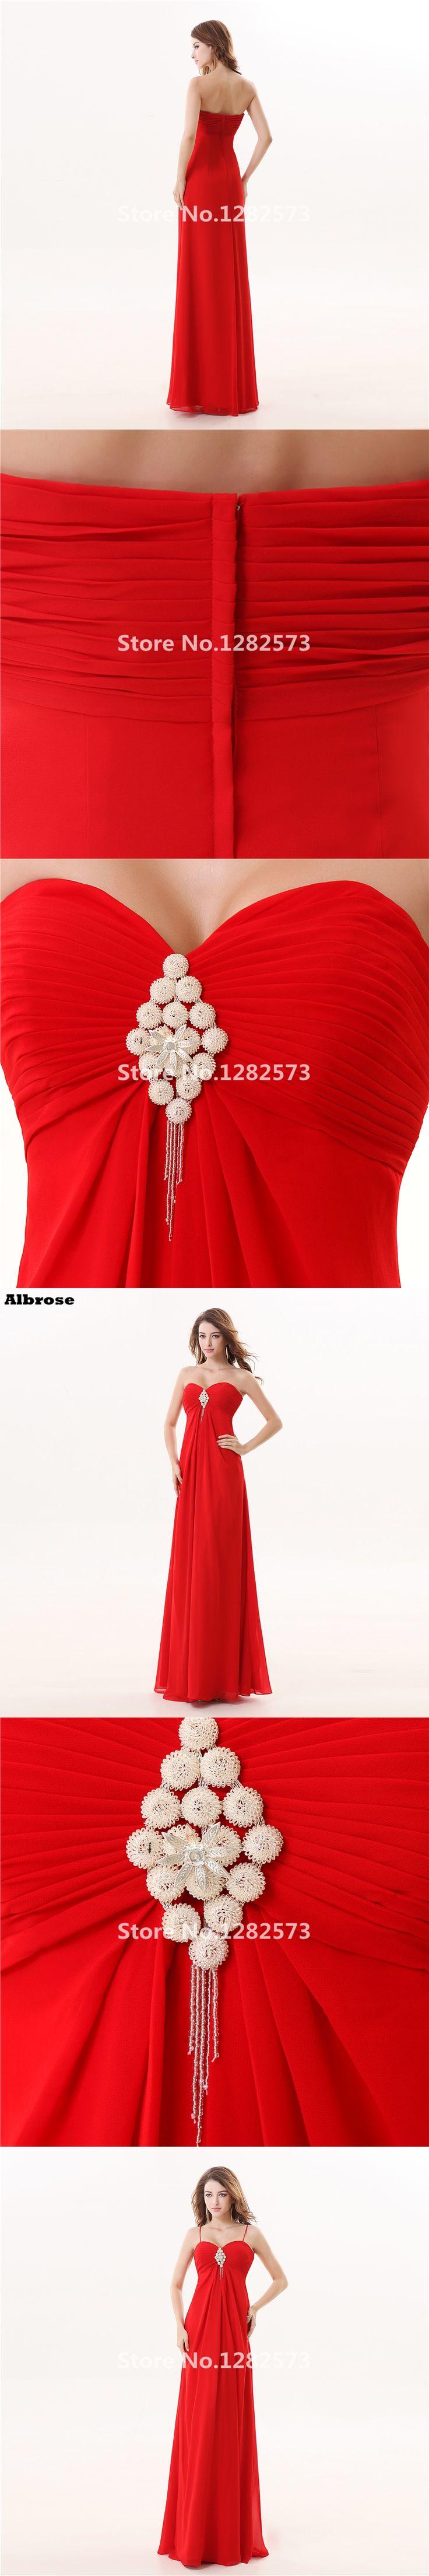 Red Beach Bridesmaid Dresses Cheap Simple Pleat Bridesmaid Dress Long Chiffon Sweetheart Formal Party Gown Chic vestido de festa